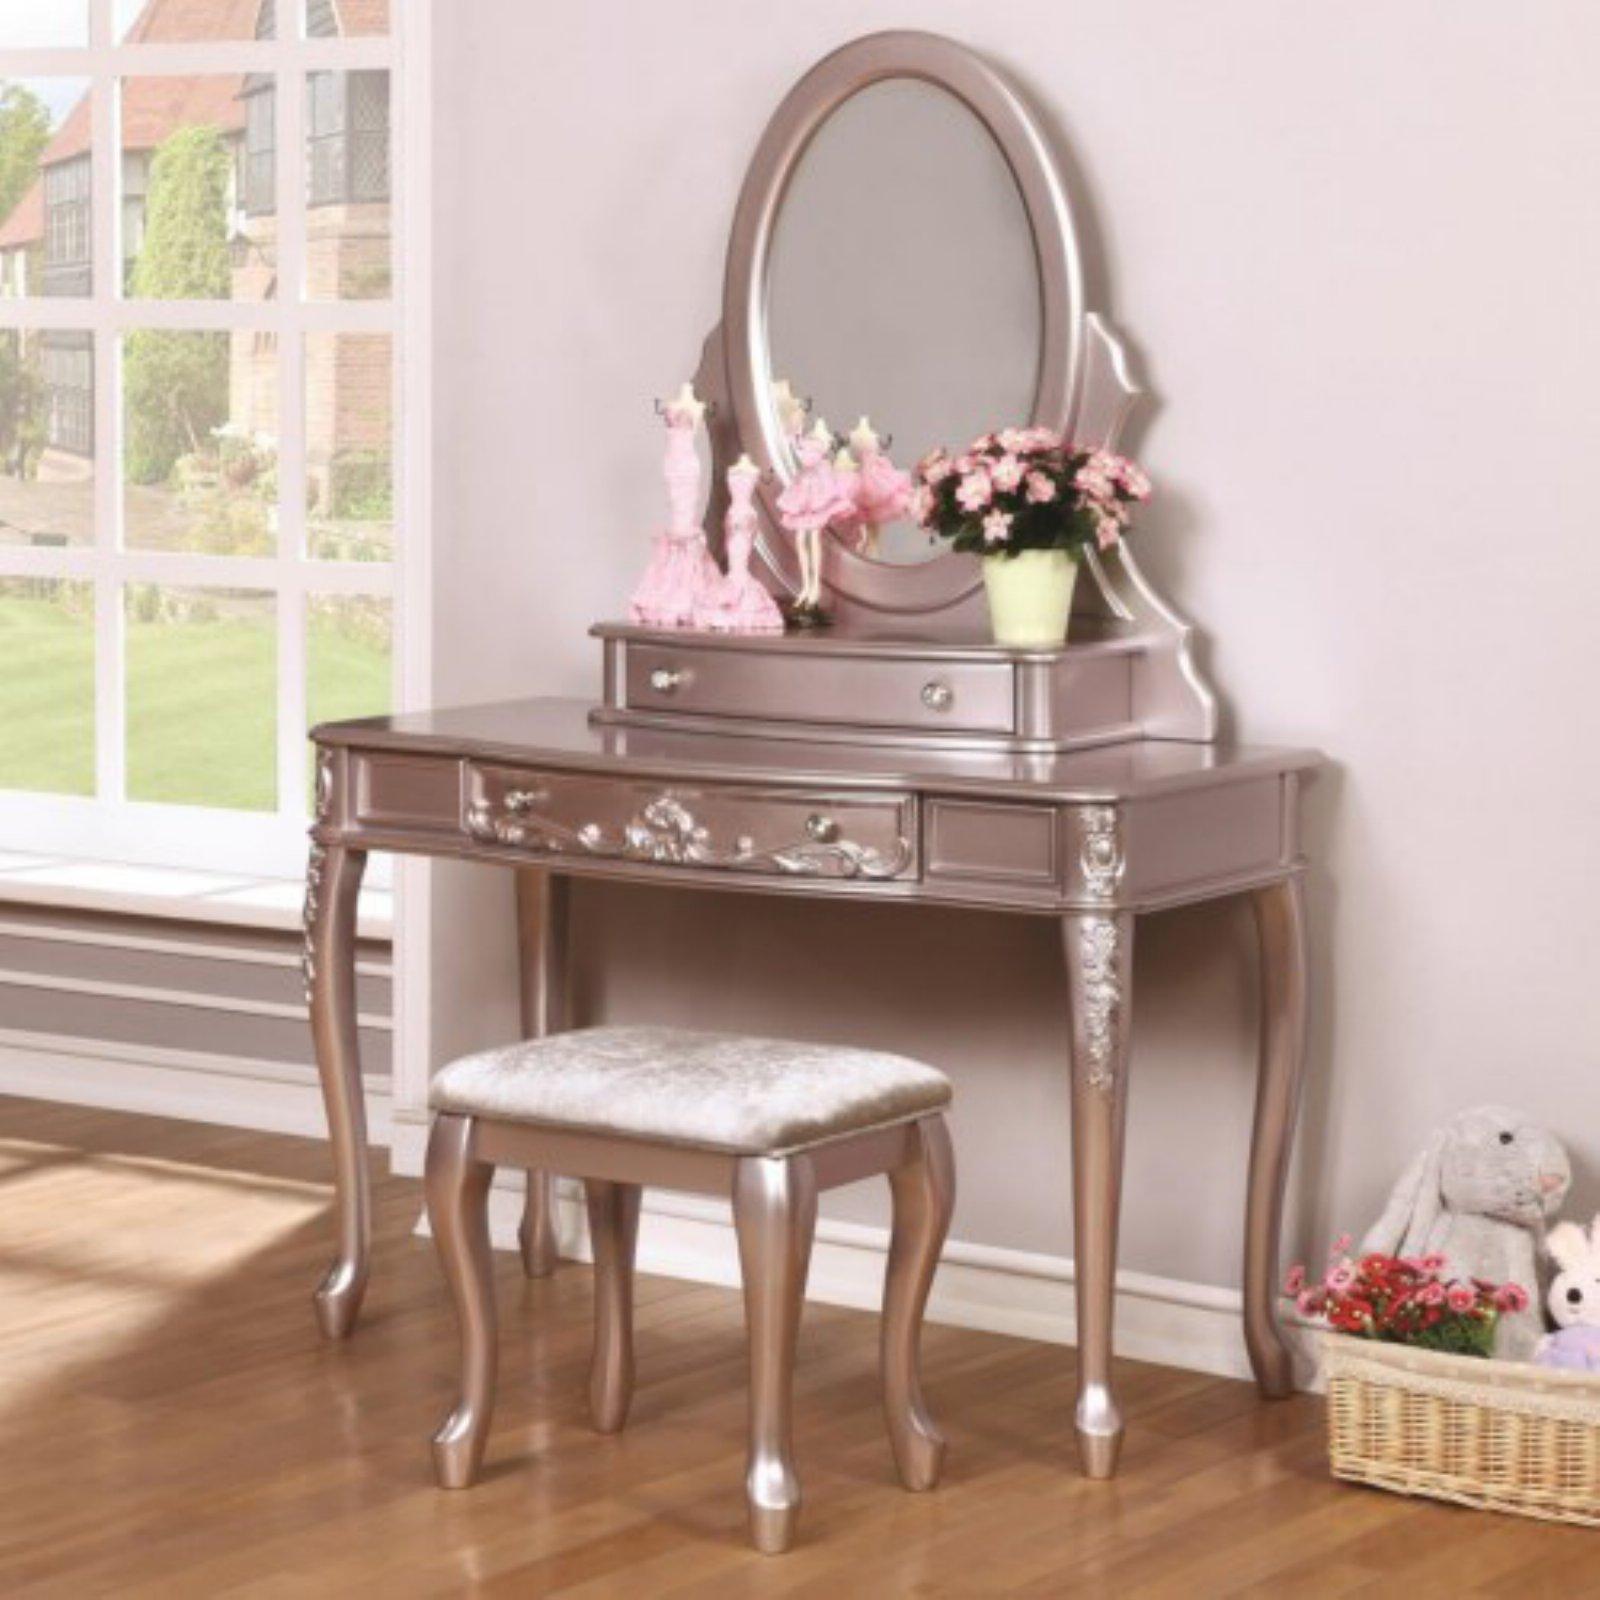 Coaster Company Caroline Vanity Mirror, Metallic Lilac (Mirror Only) by Coaster Company